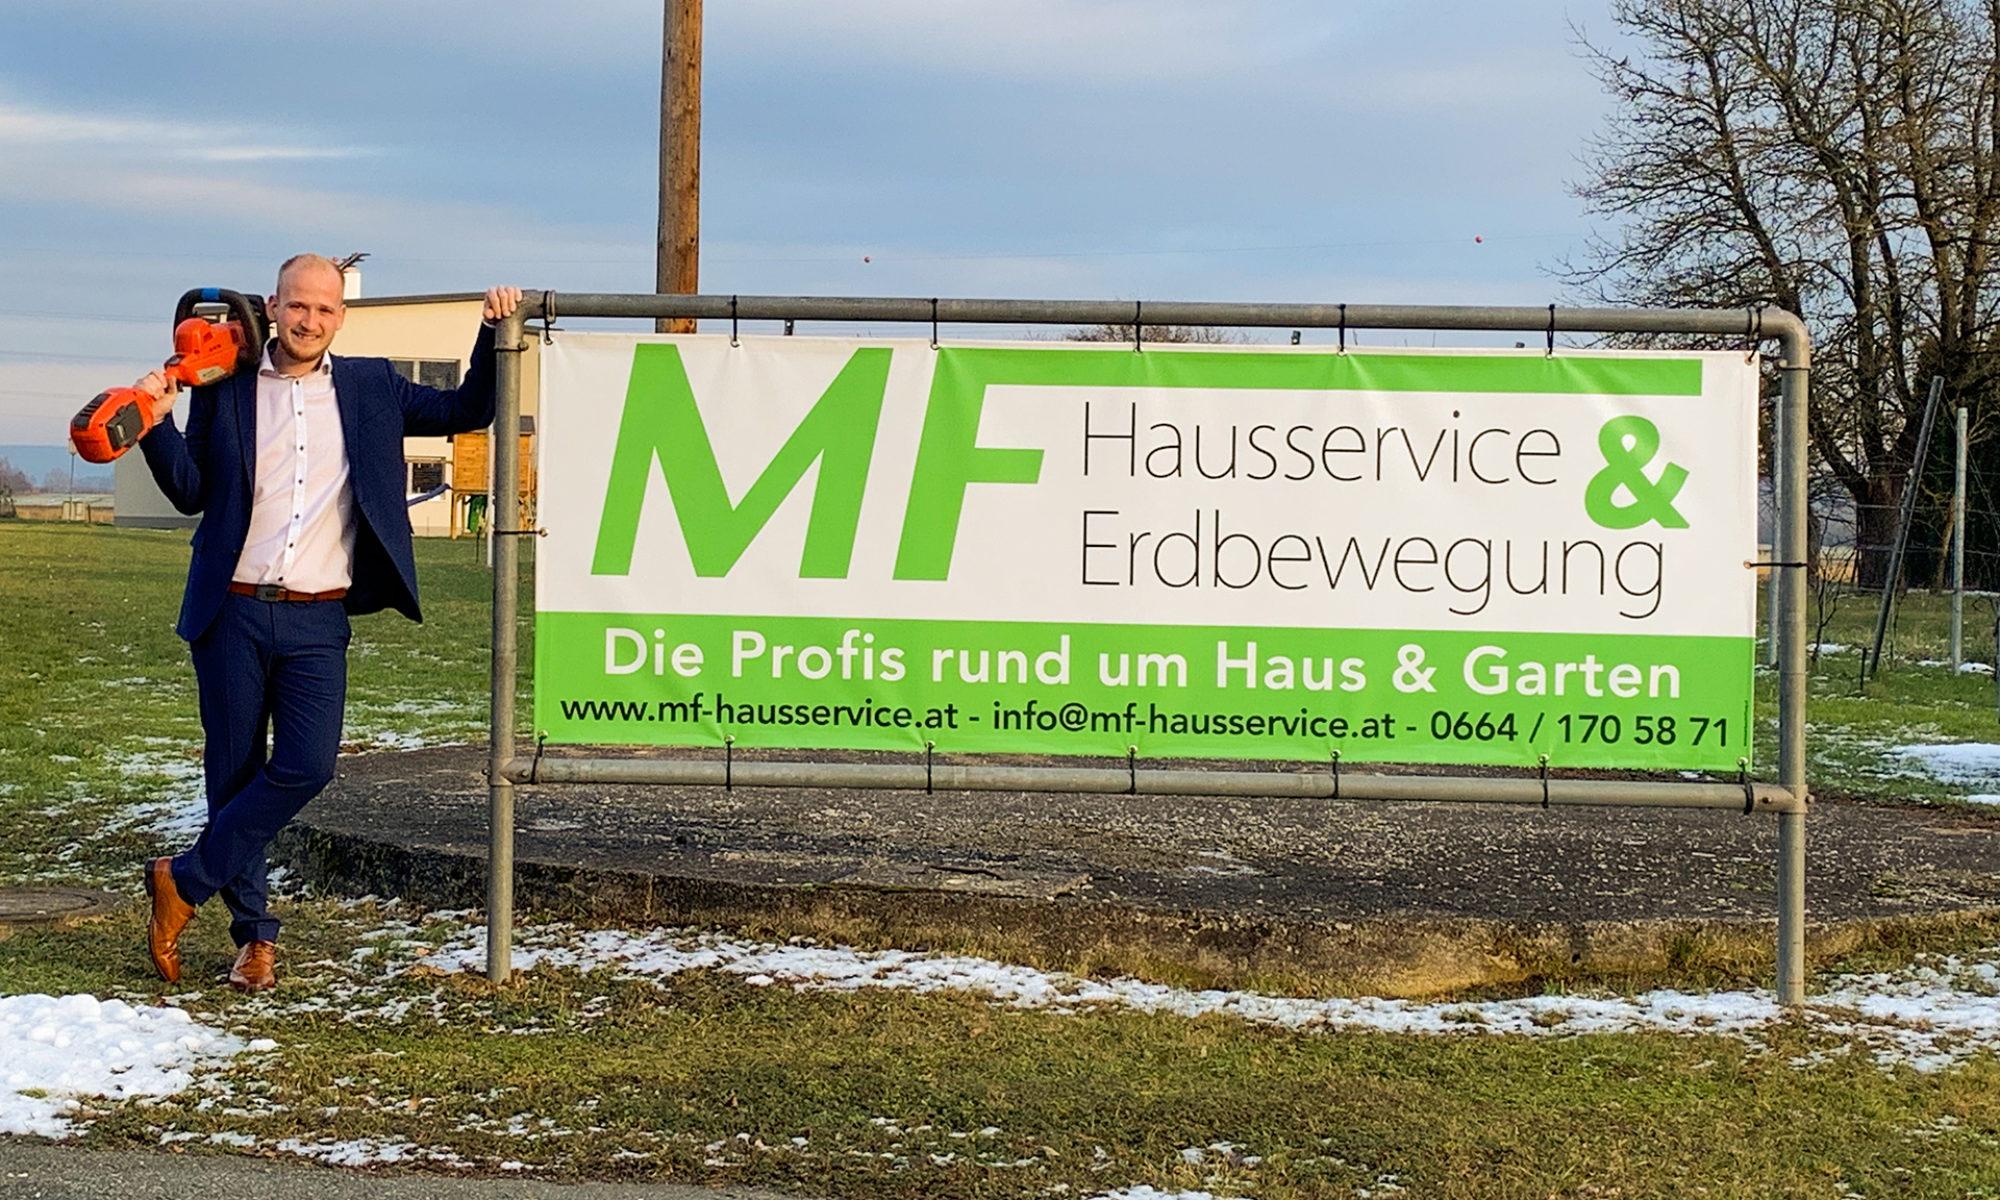 MF Hausservice & Erdbewegung